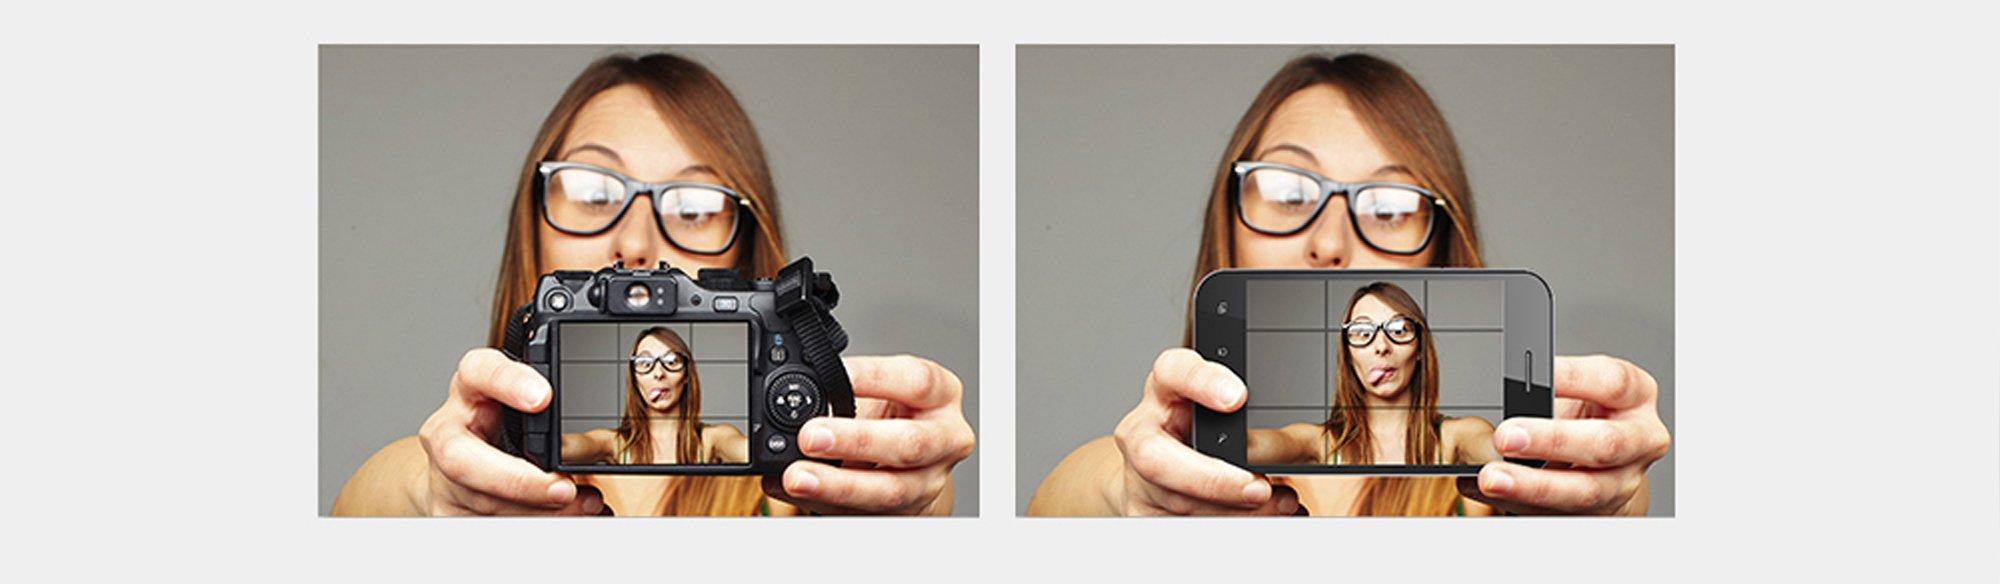 Morgan Media LLC, Graphic Design, Miami, Photo Editing